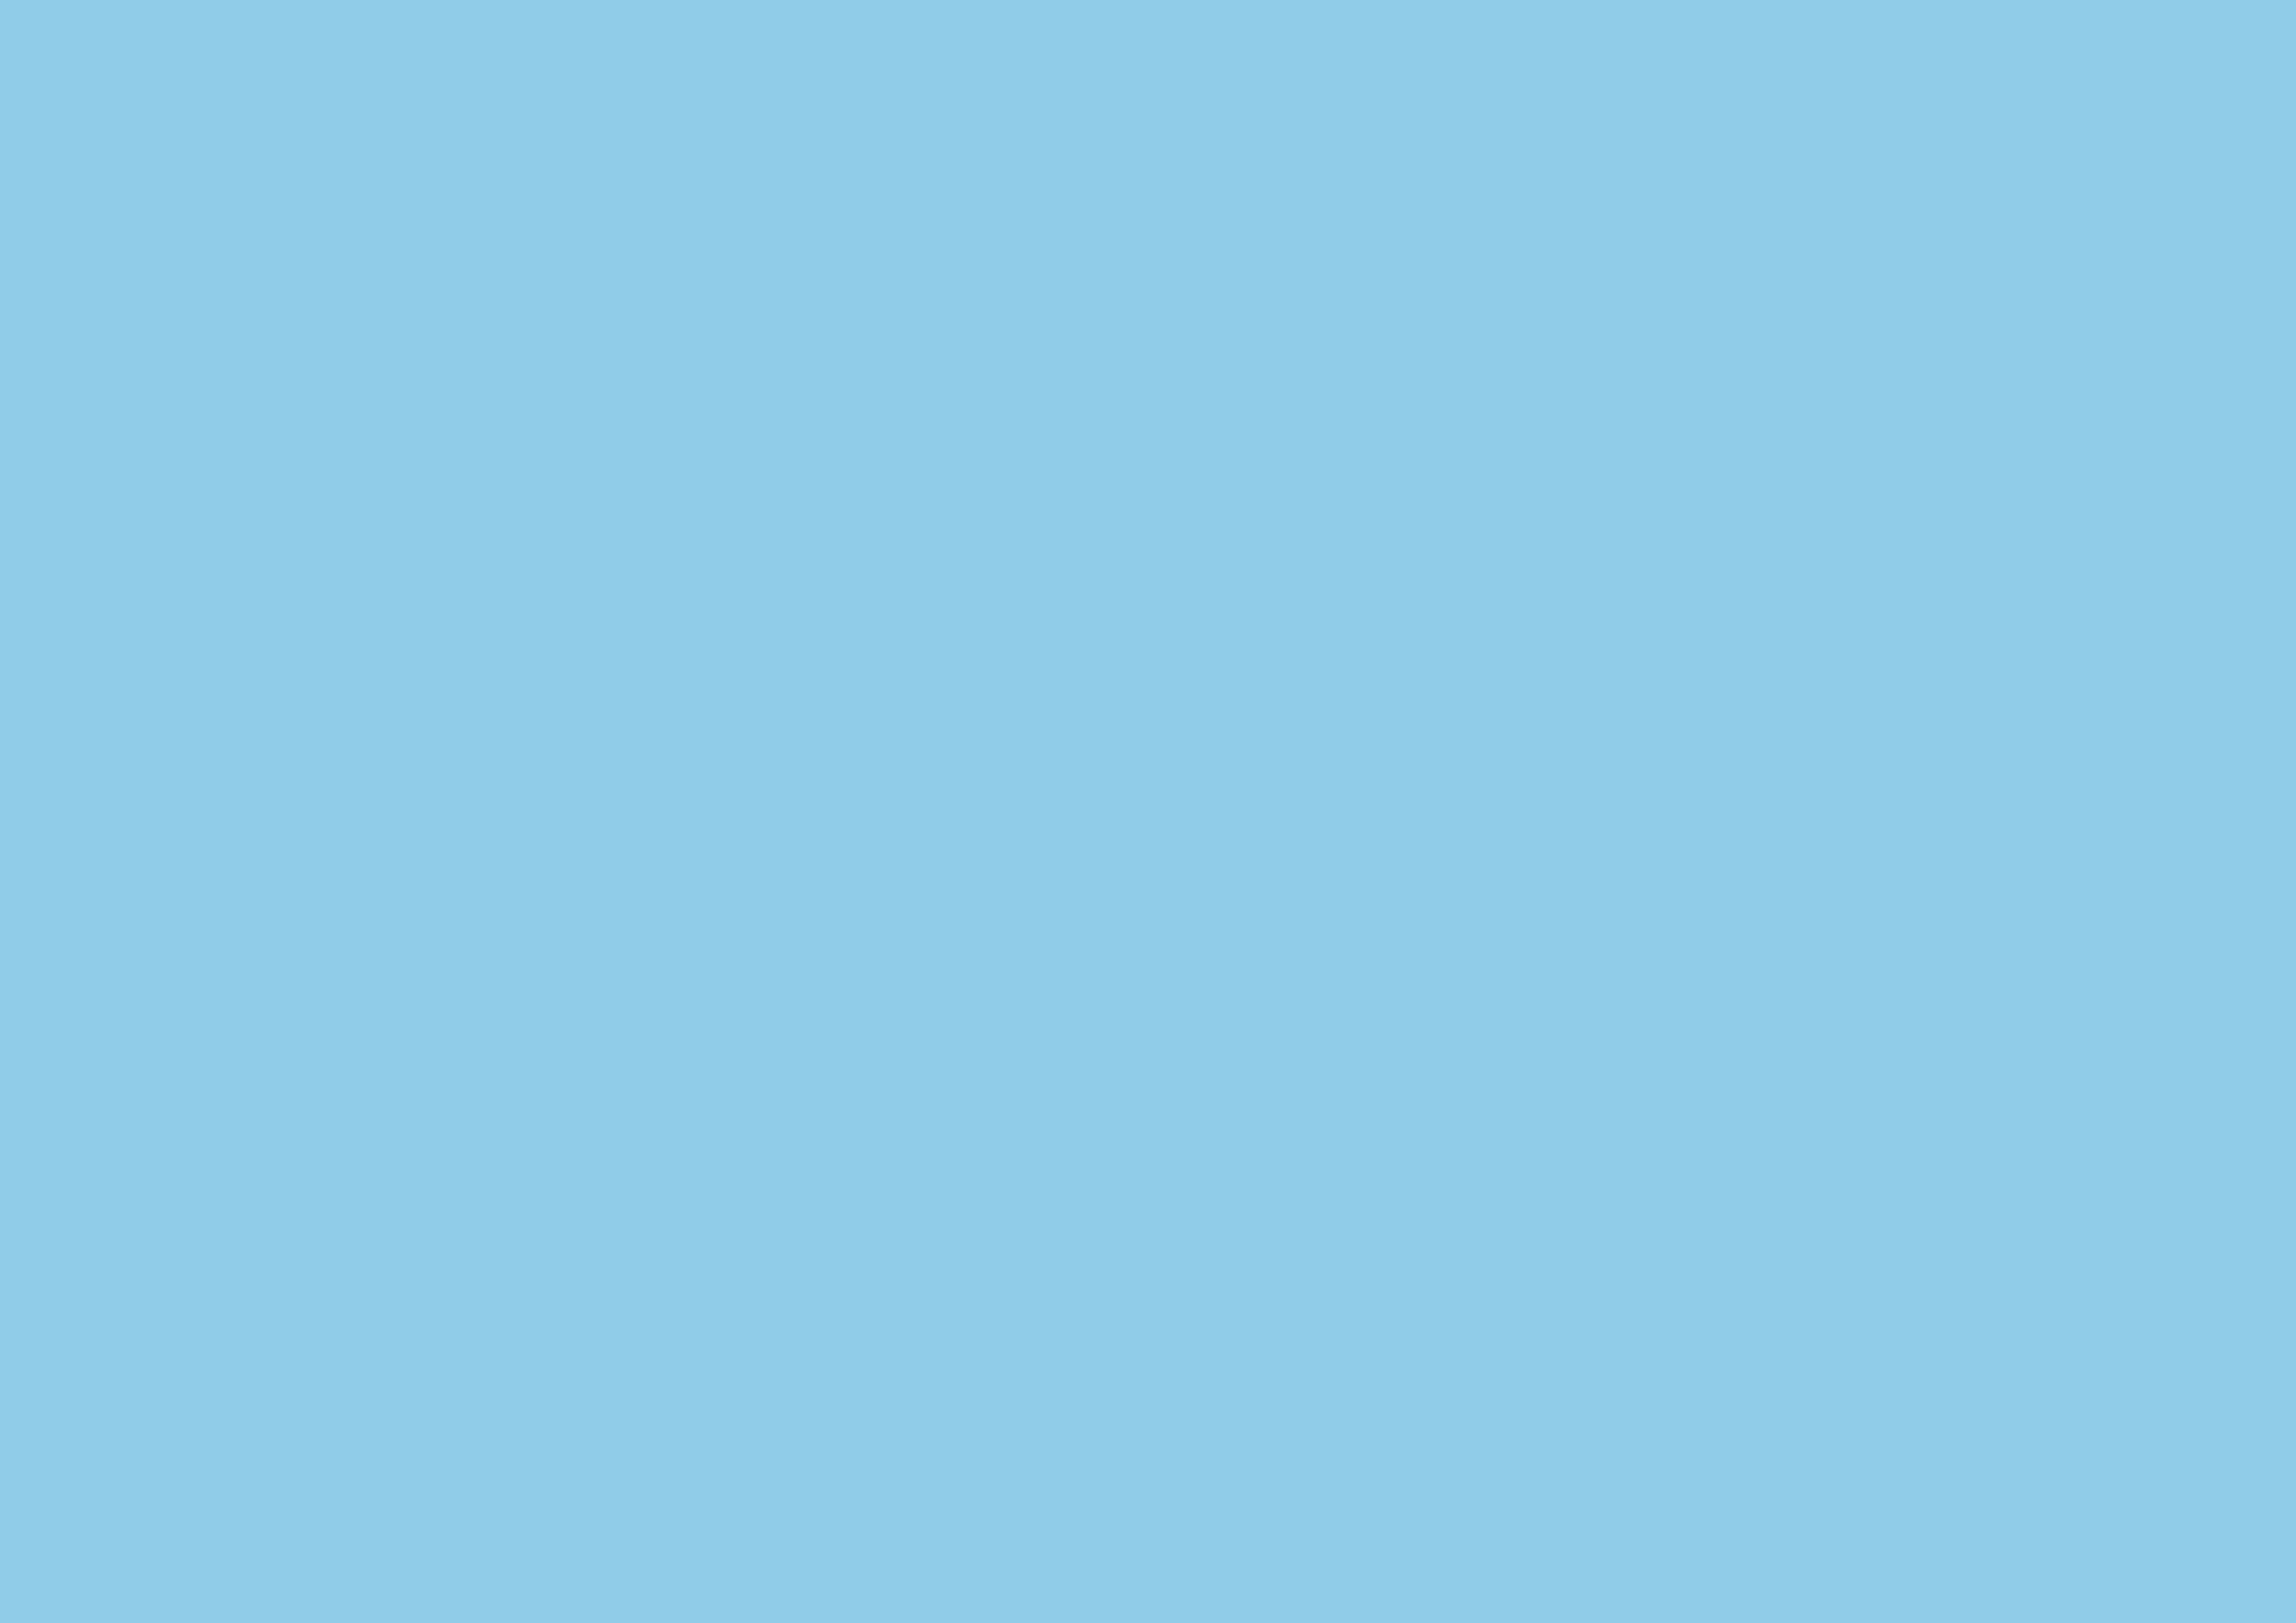 3508x2480 Light Cornflower Blue Solid Color Background